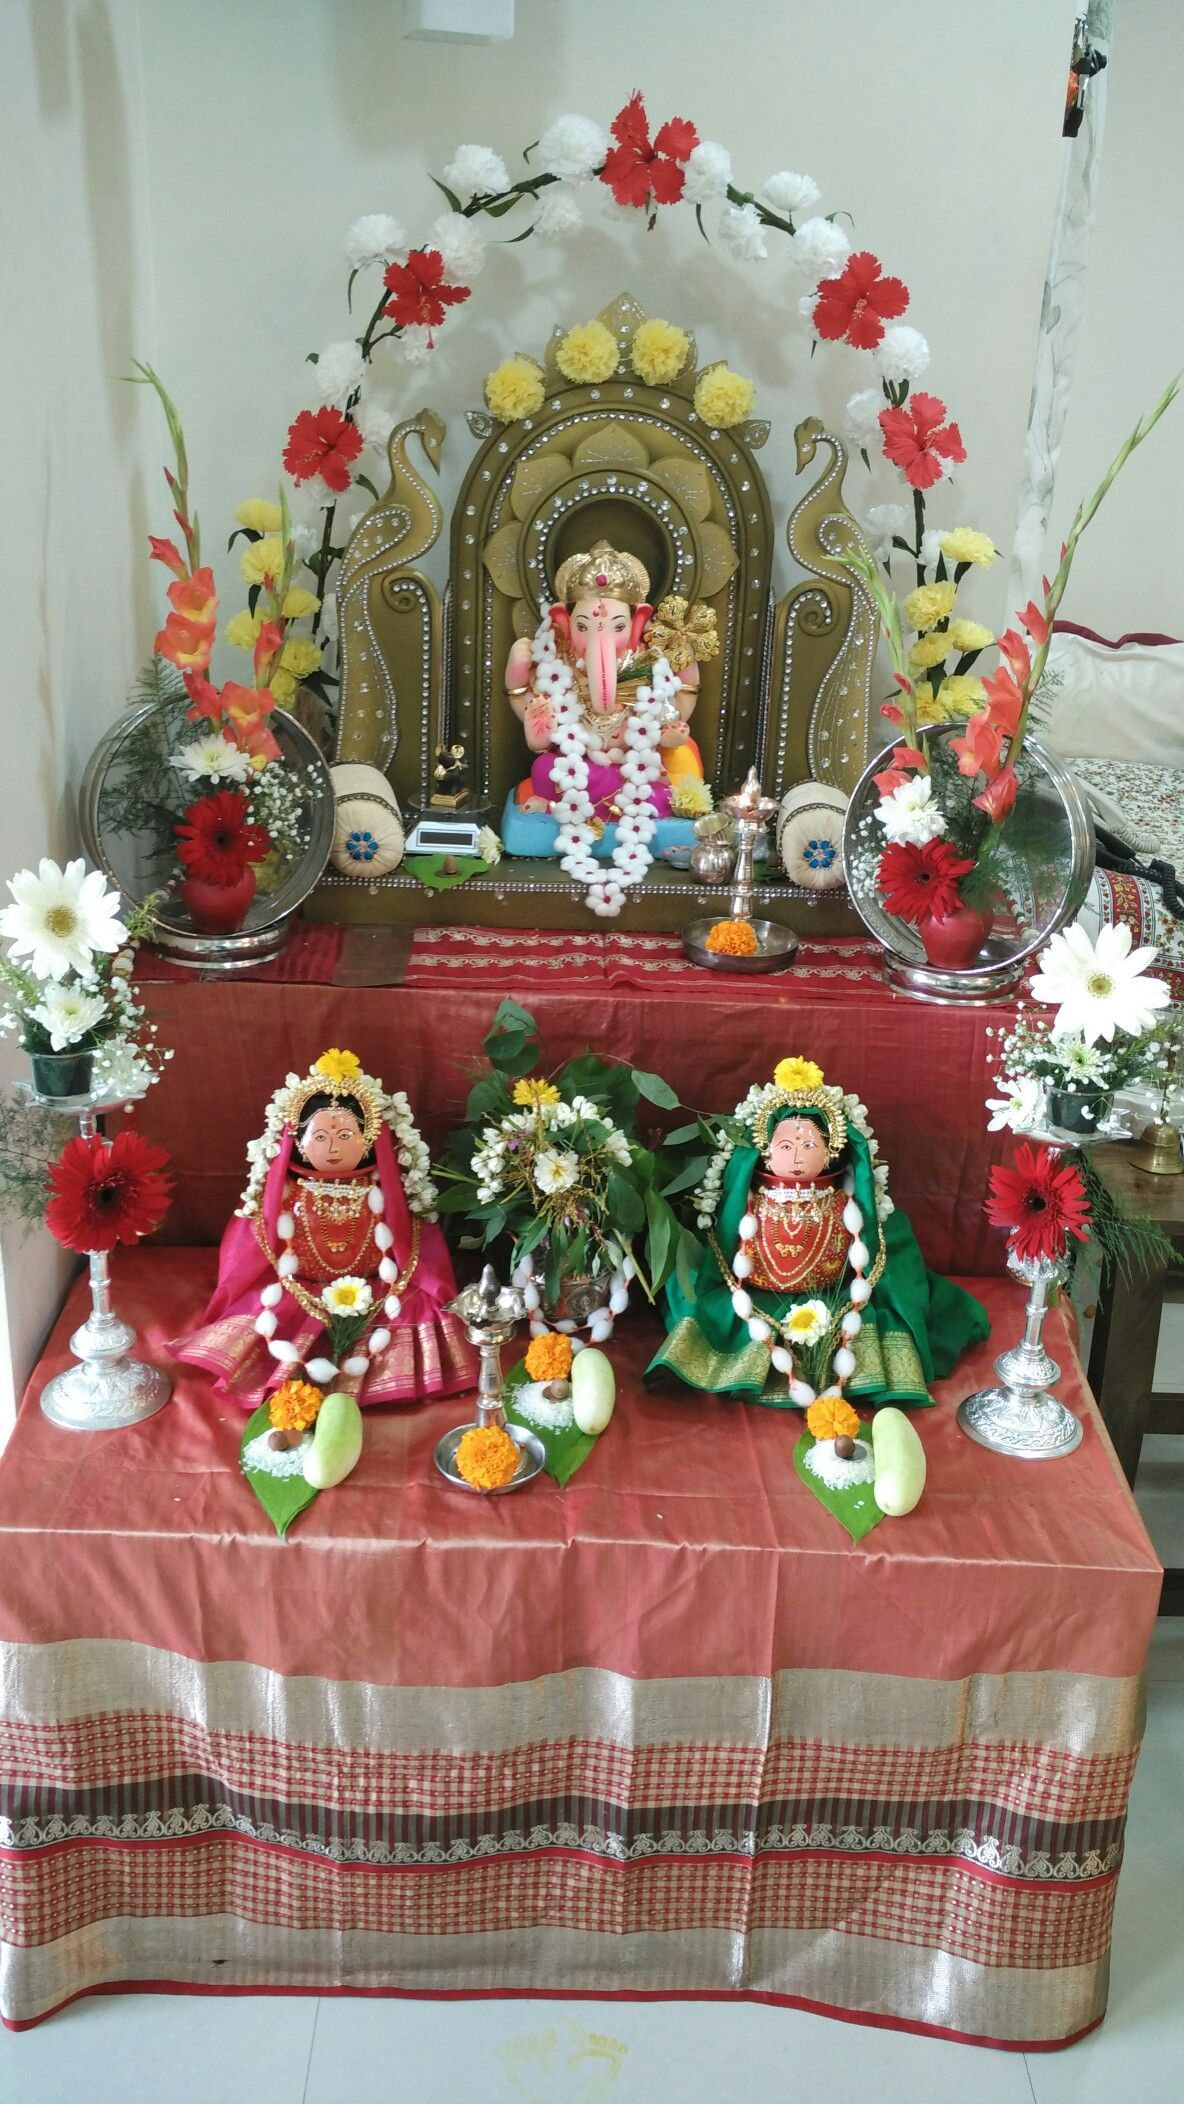 GANESH Chaturti And Gauri Pooja. Ganpati Decoration IdeasPuja RoomHouse ...